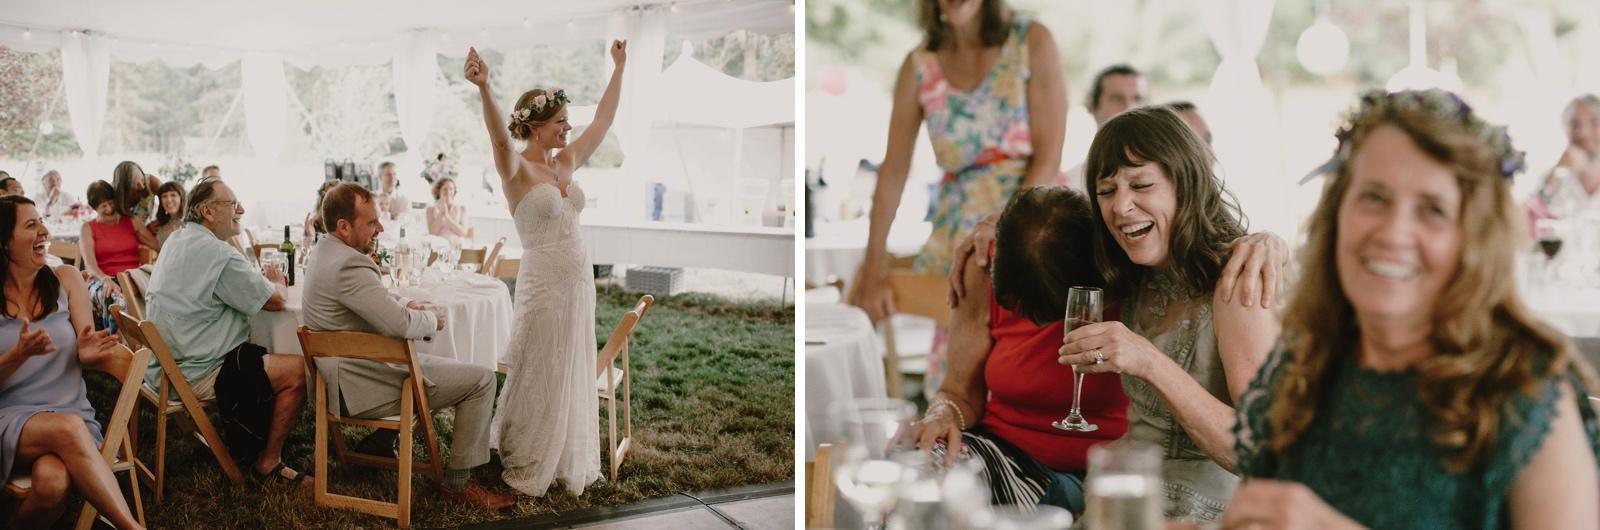 Backyard_Vashon_Island_Wedding_Kristen_Marie_Parker066.JPG